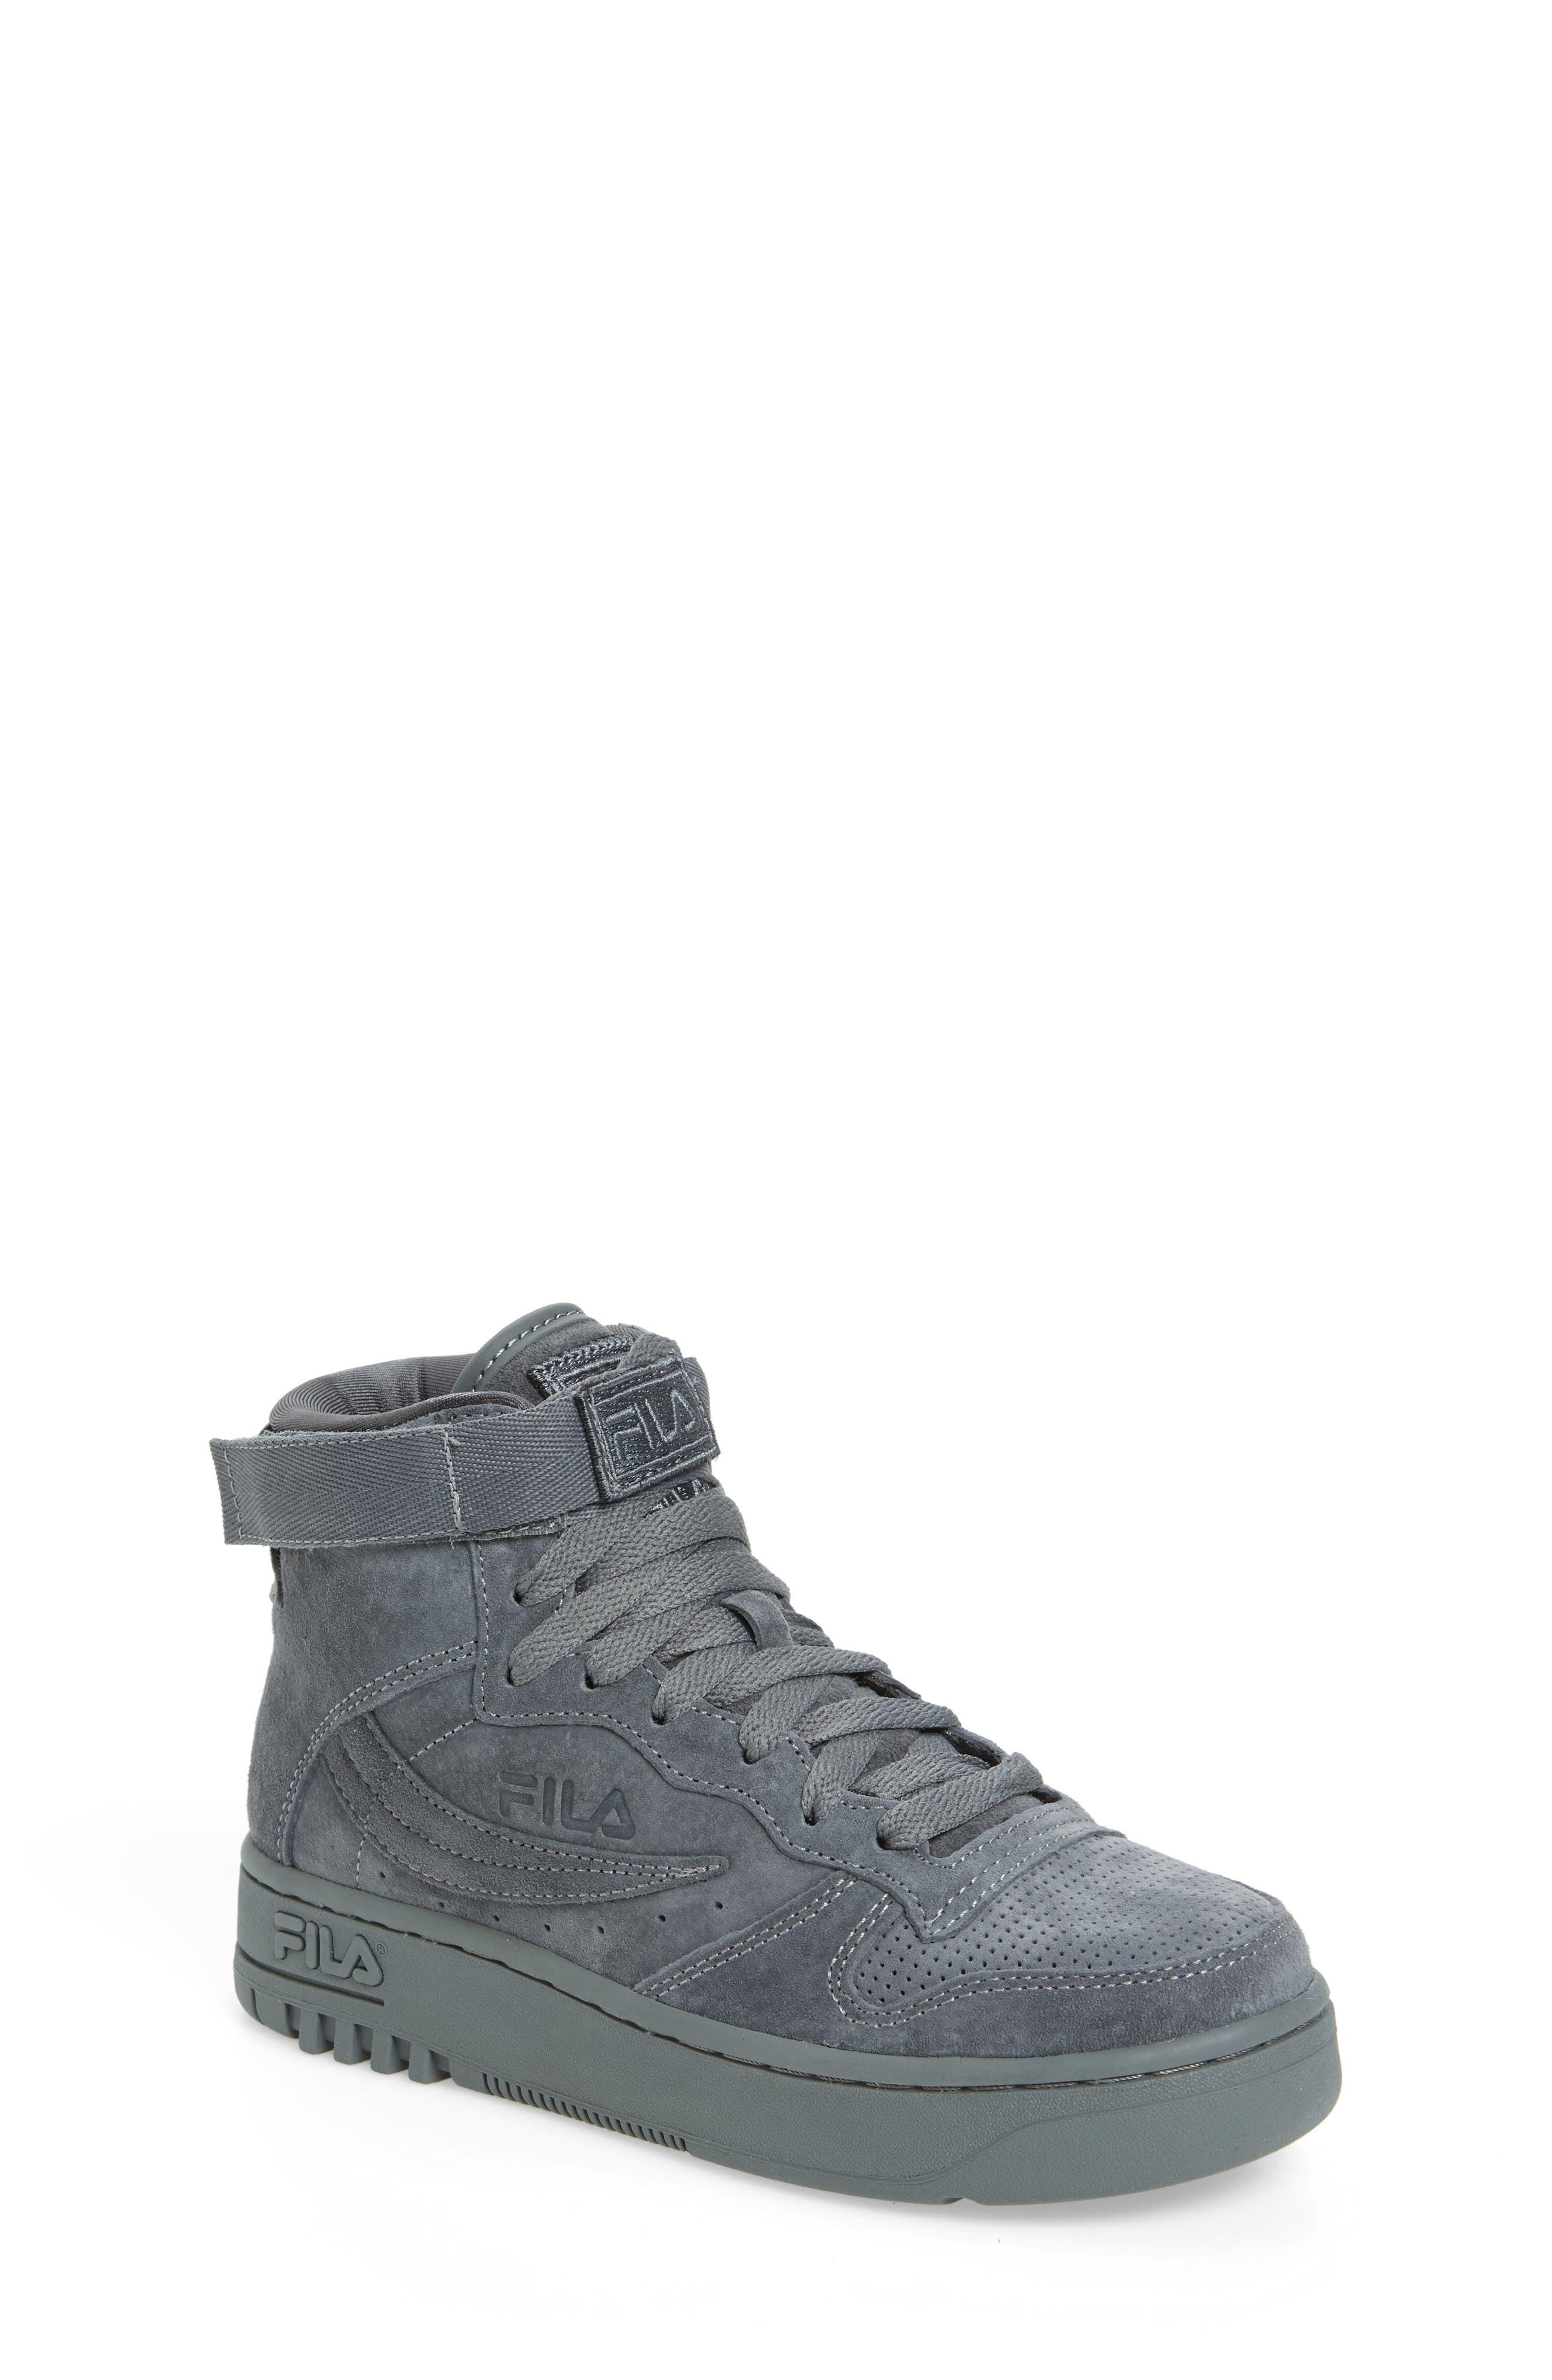 USA FX-100 High Top Sneaker,                         Main,                         color, 050